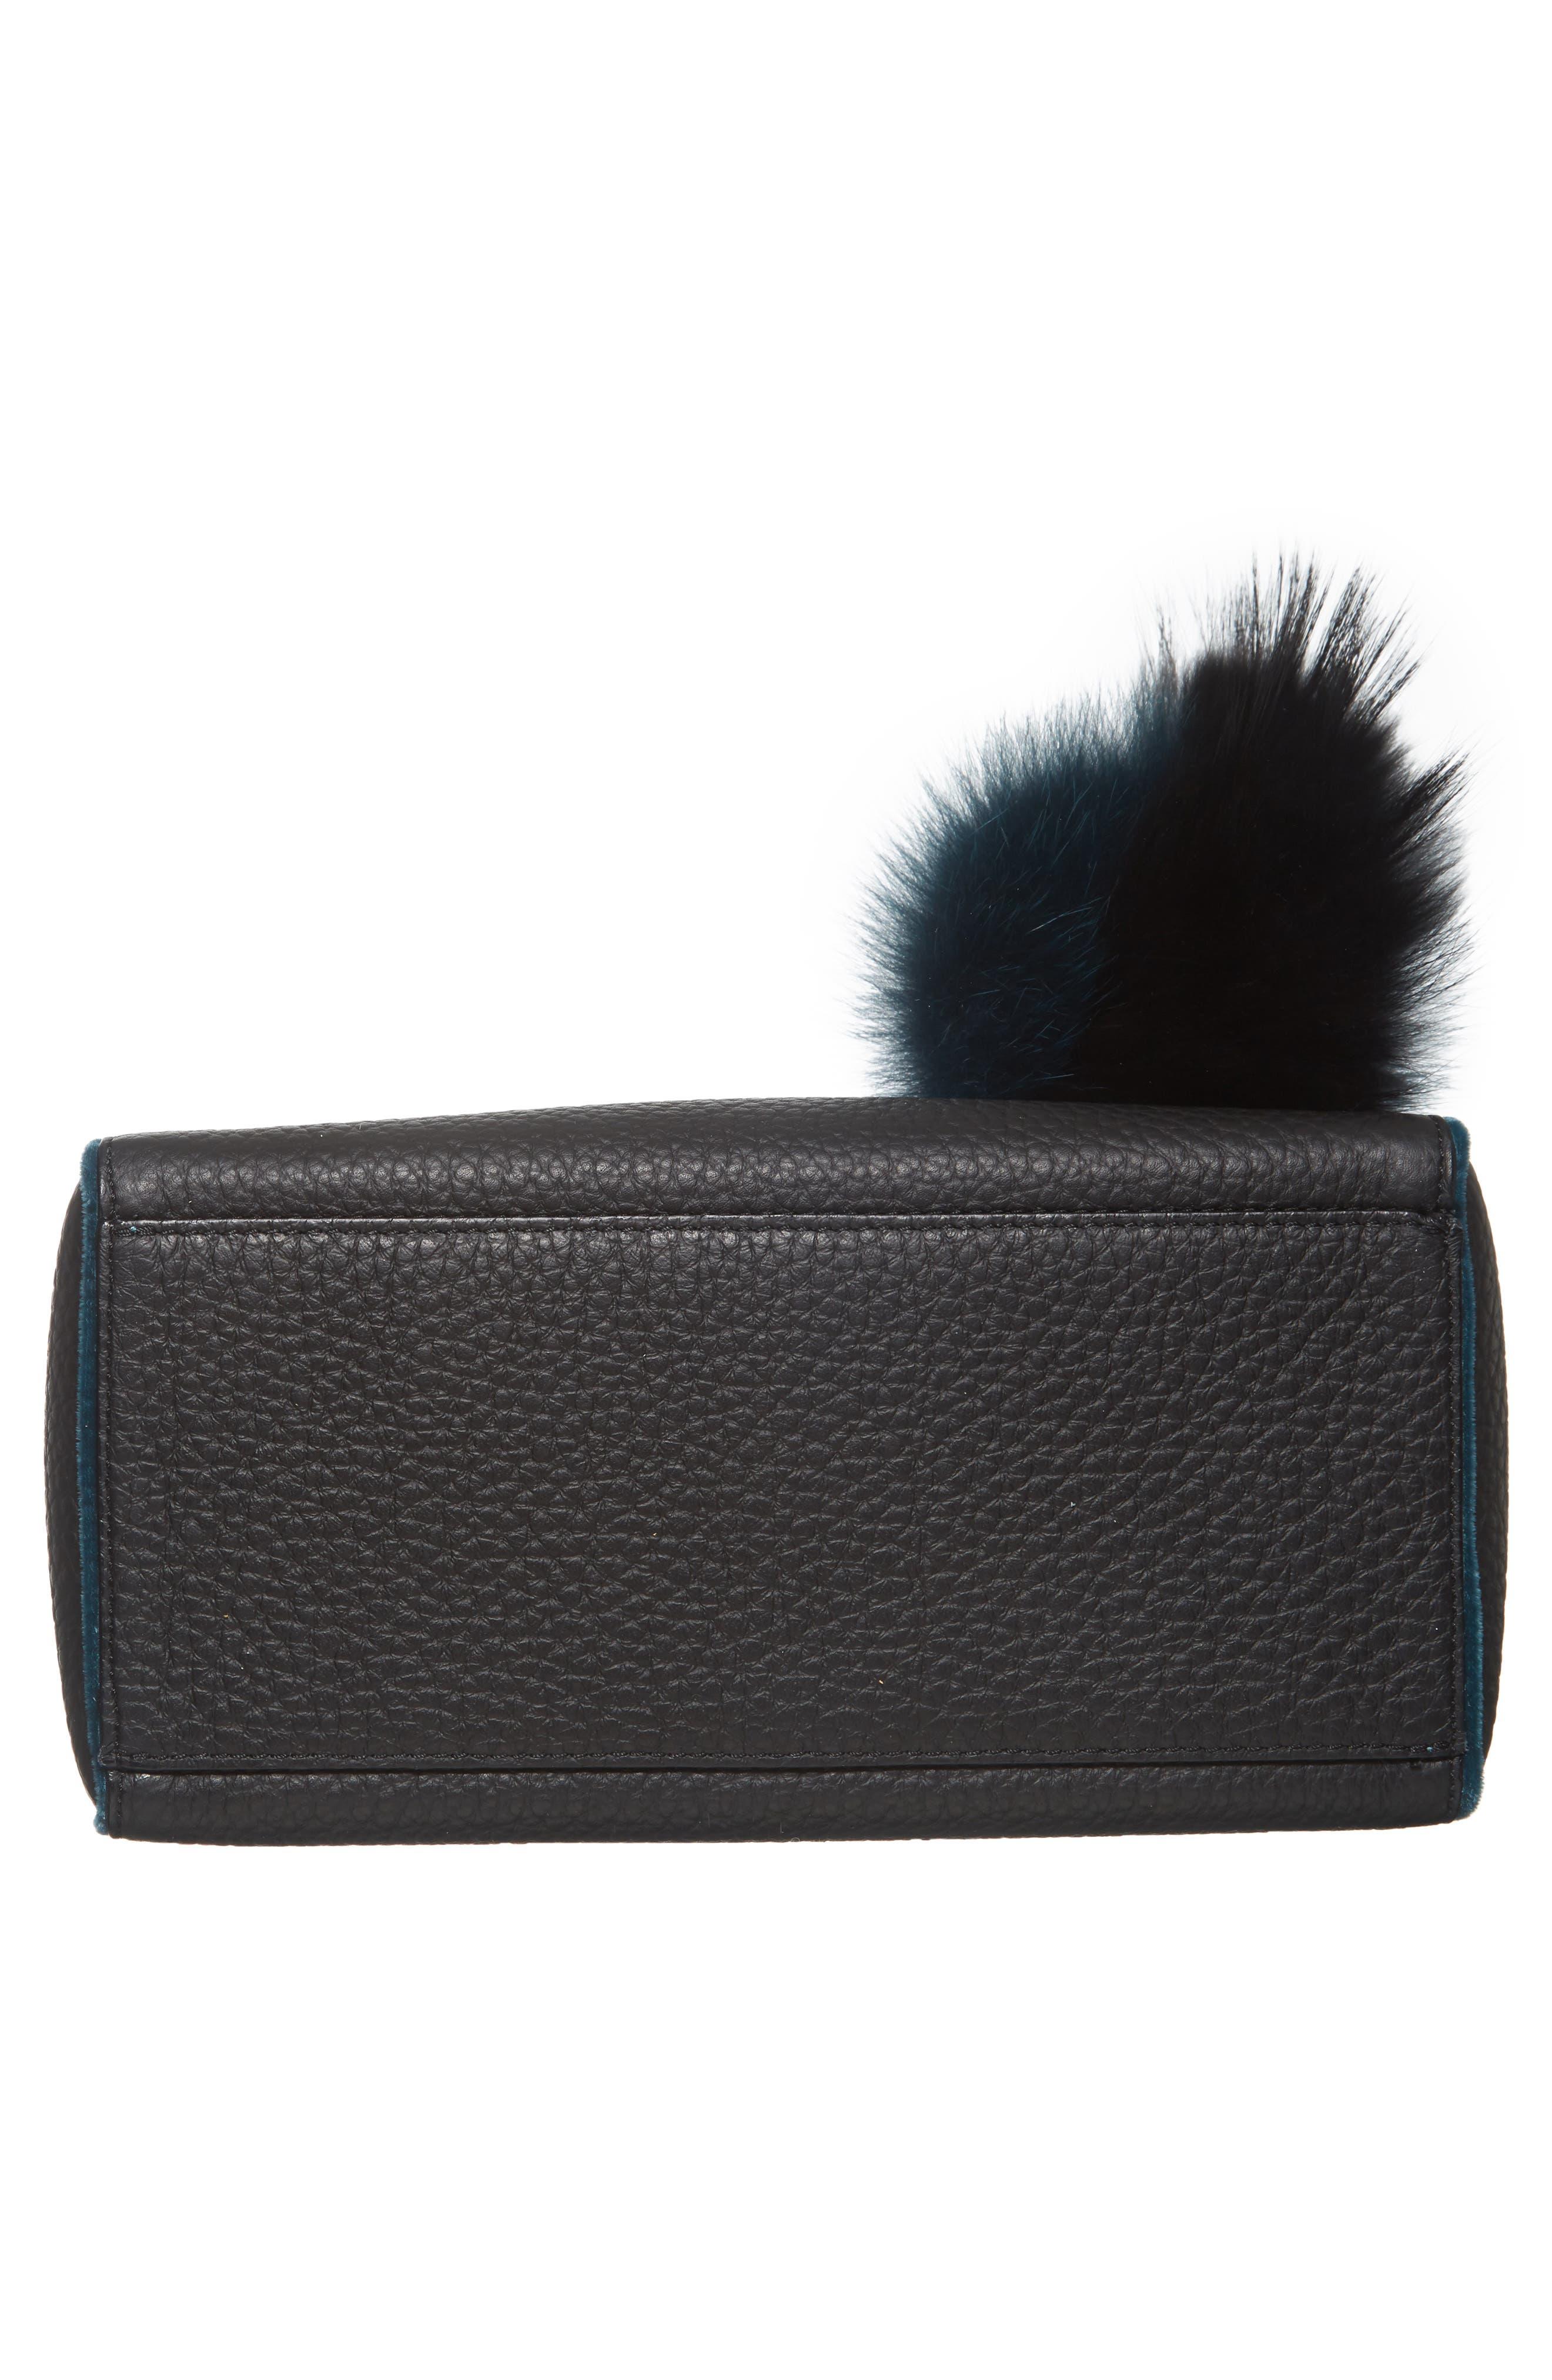 Small Sveva Soft Leather Top Handle Satchel with Genuine Fur Bag Charm,                             Alternate thumbnail 6, color,                             300